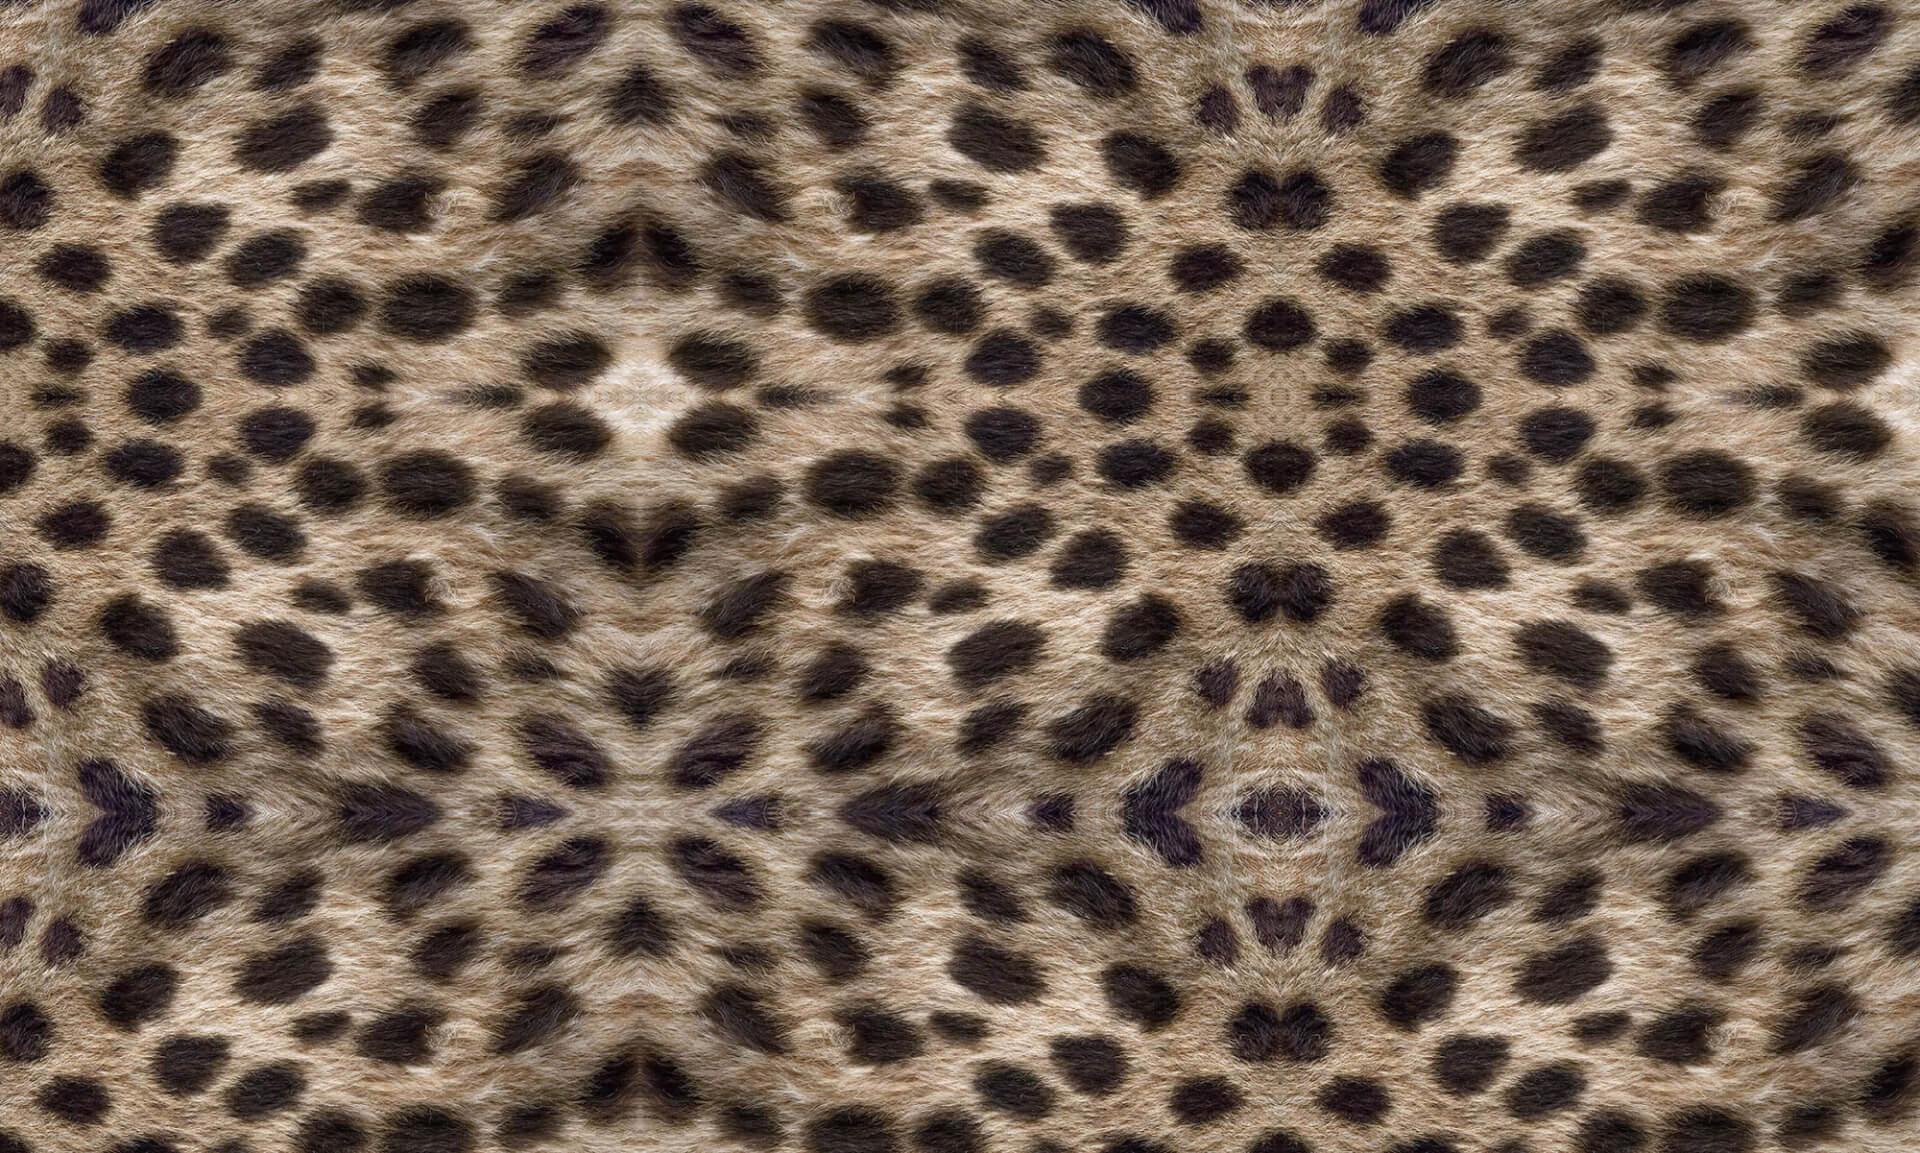 Cheetah Doug Garrabrants